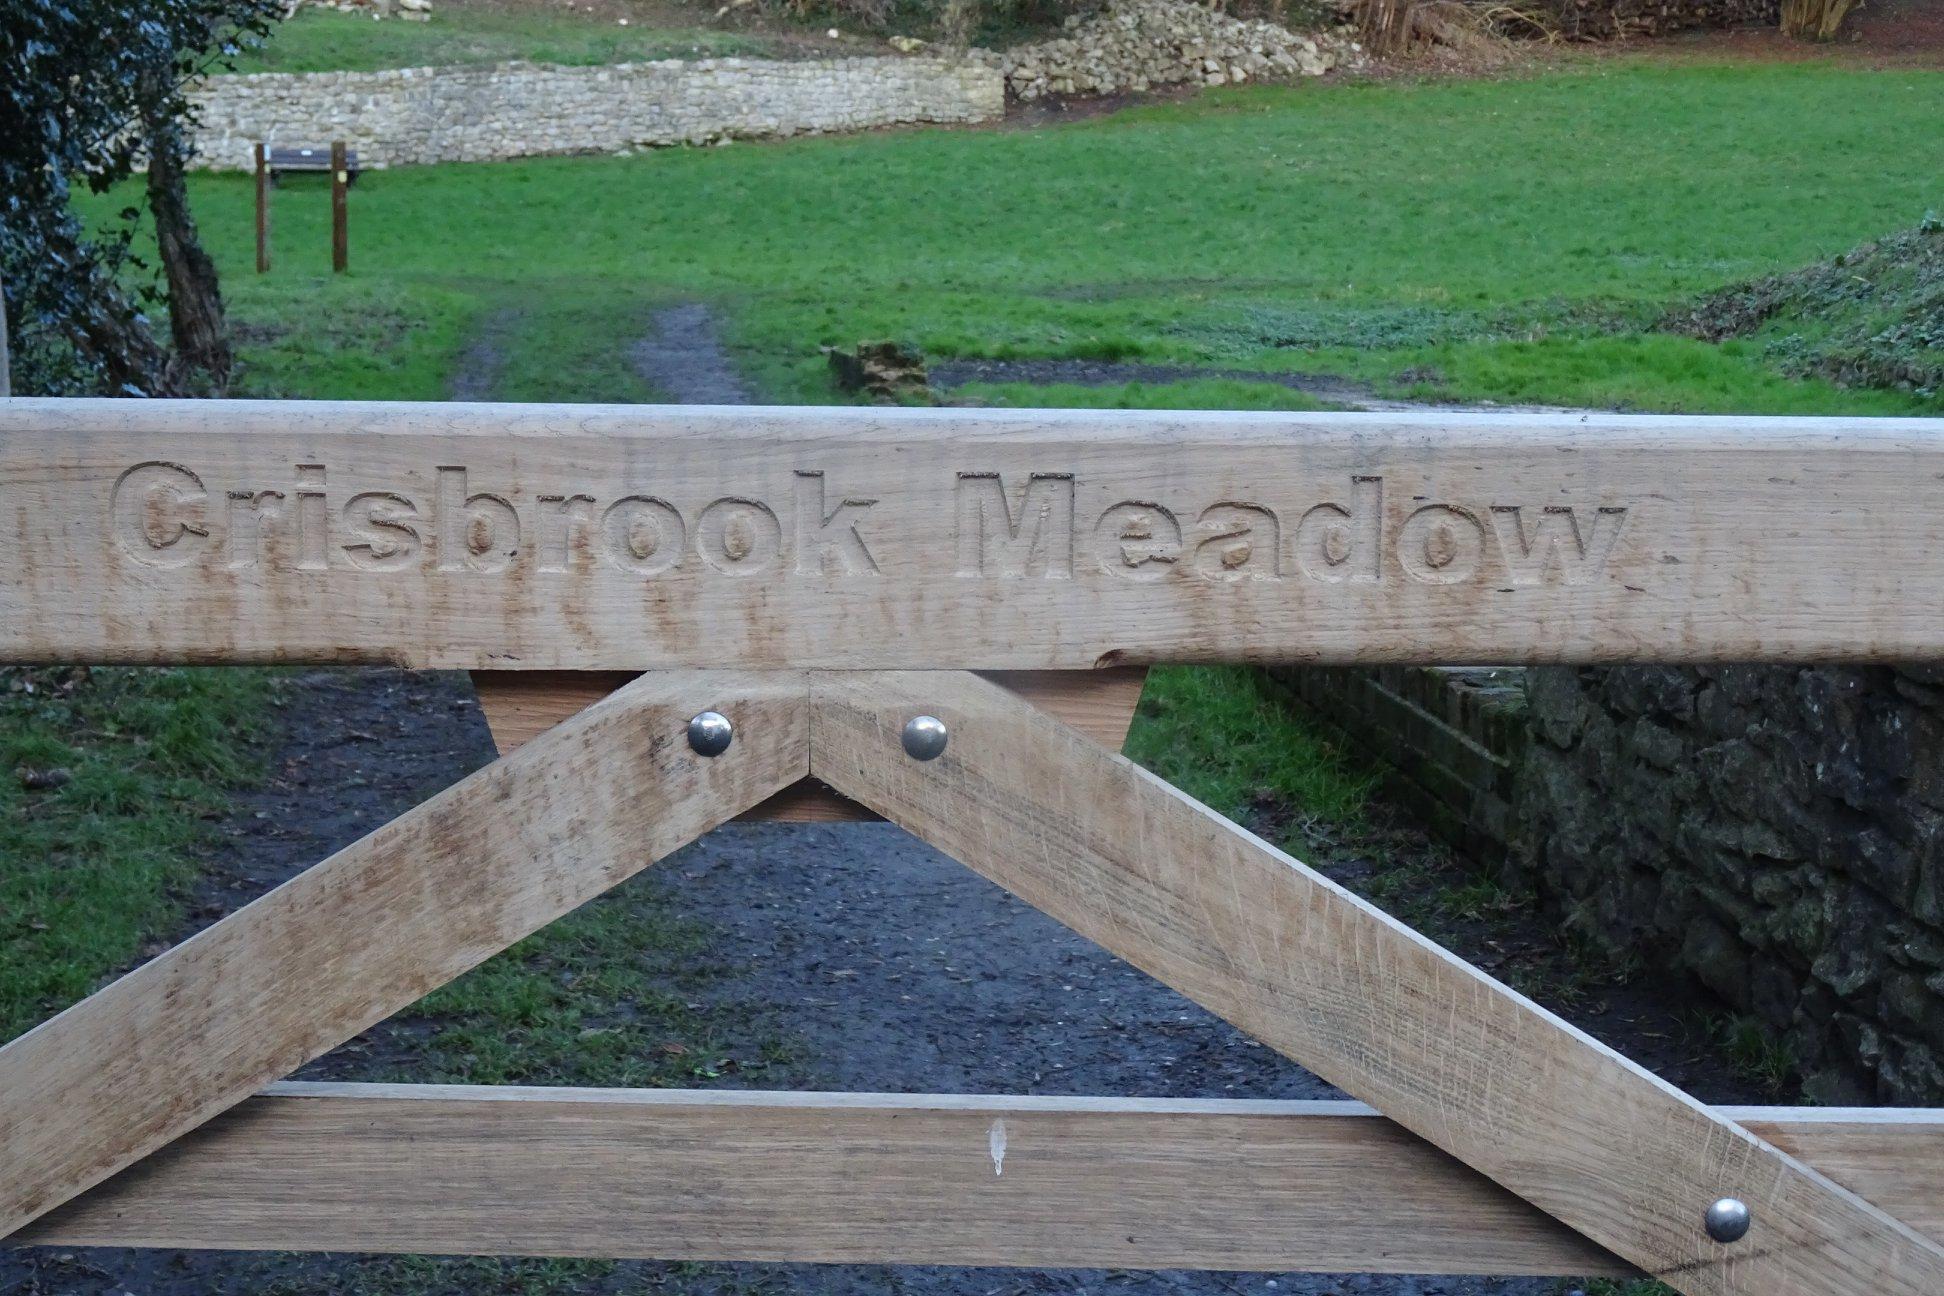 Crisbrook Meadow Gate - 1